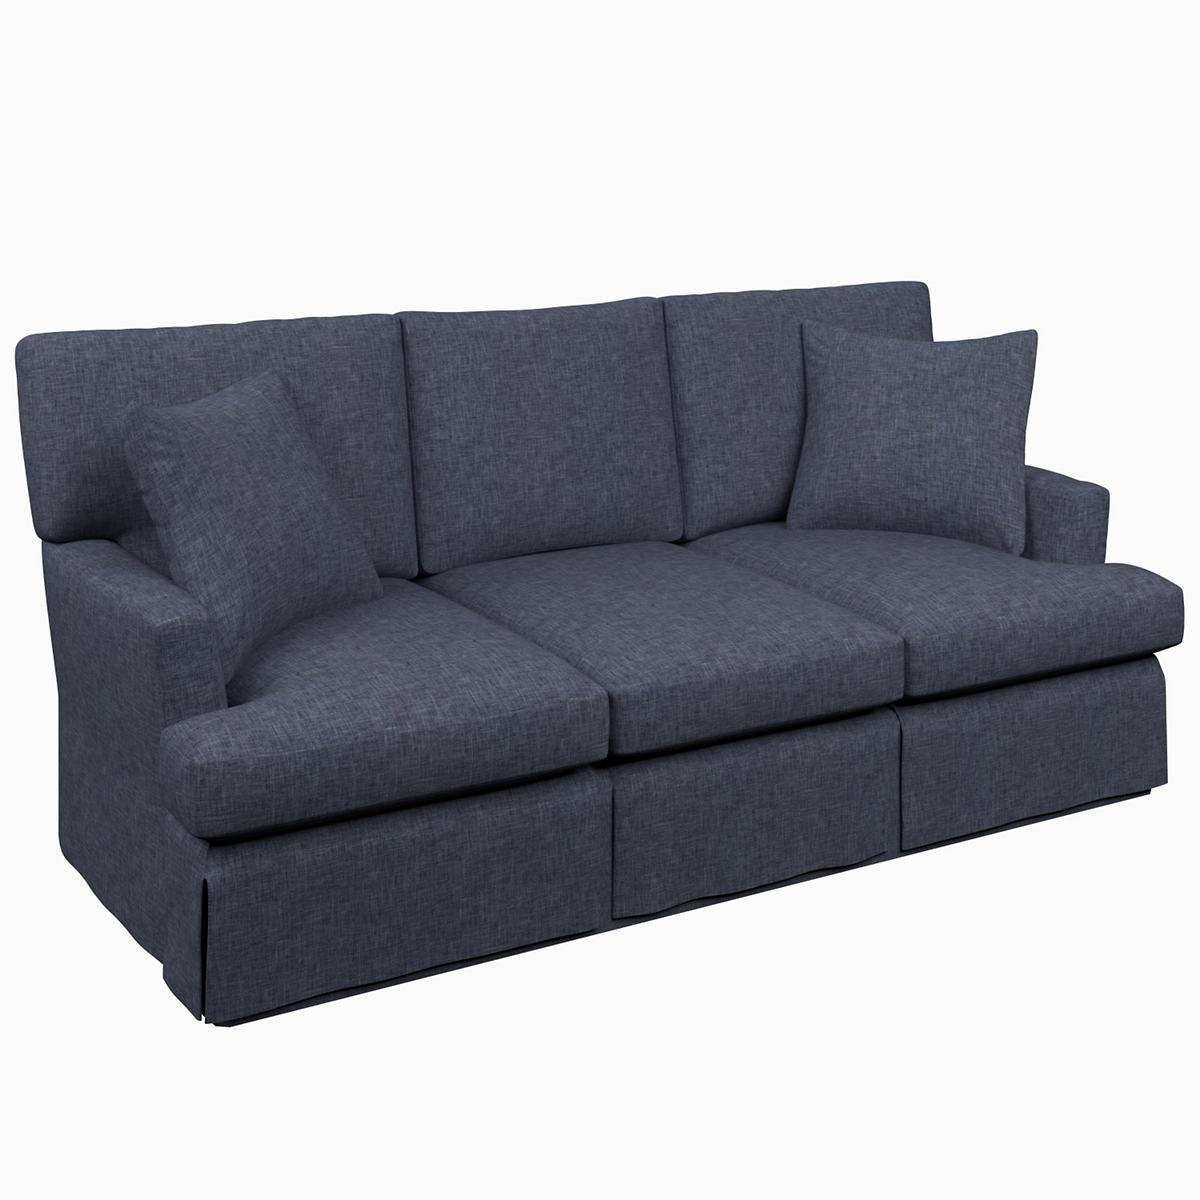 Greylock Navy Saybrook 3 Seater Slipcovered Sofa